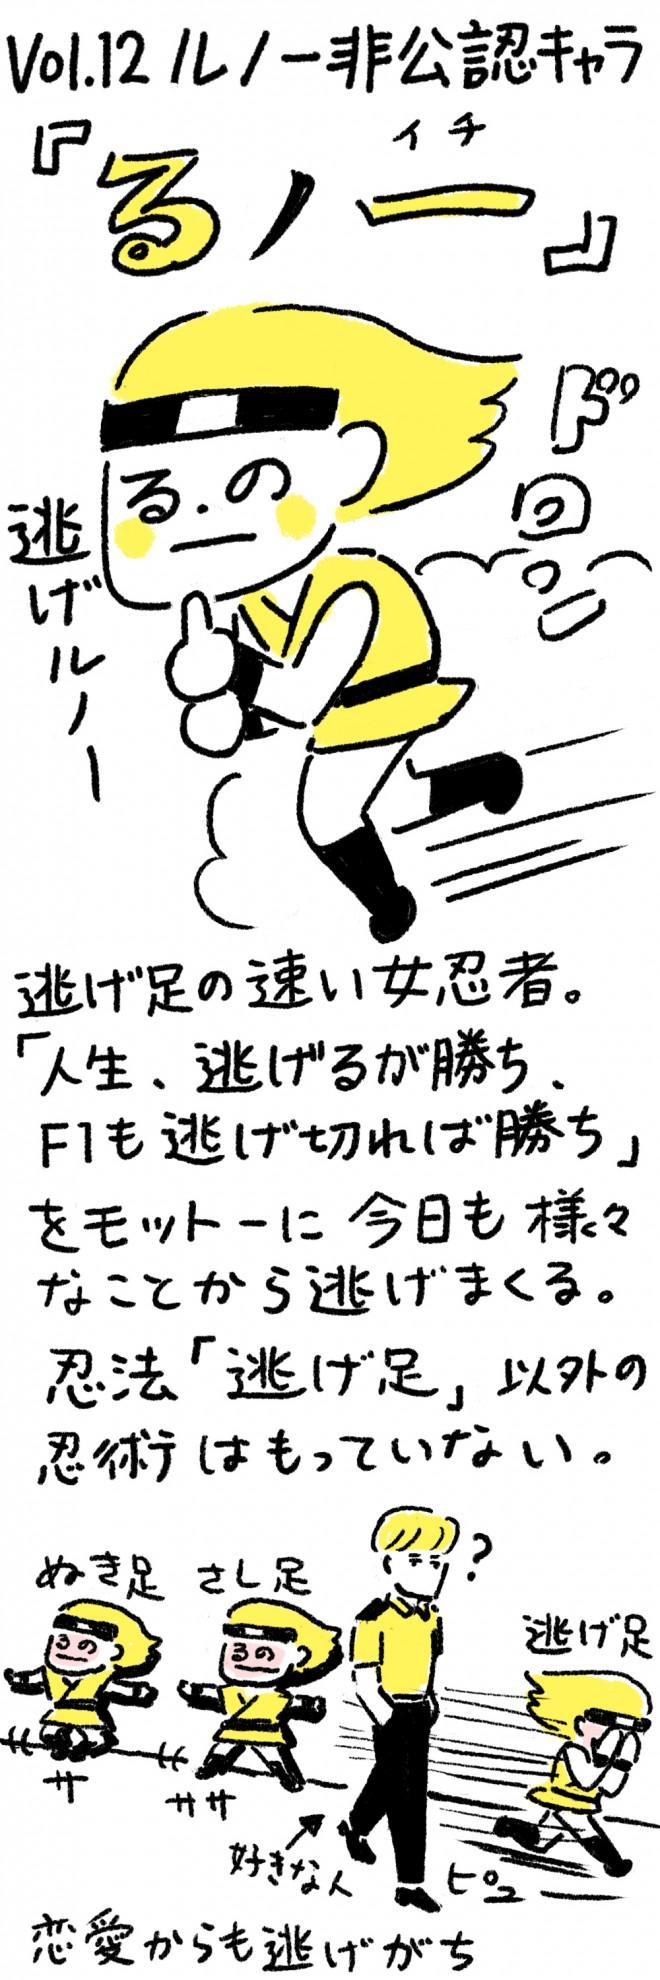 F1CHARA_12_Ren